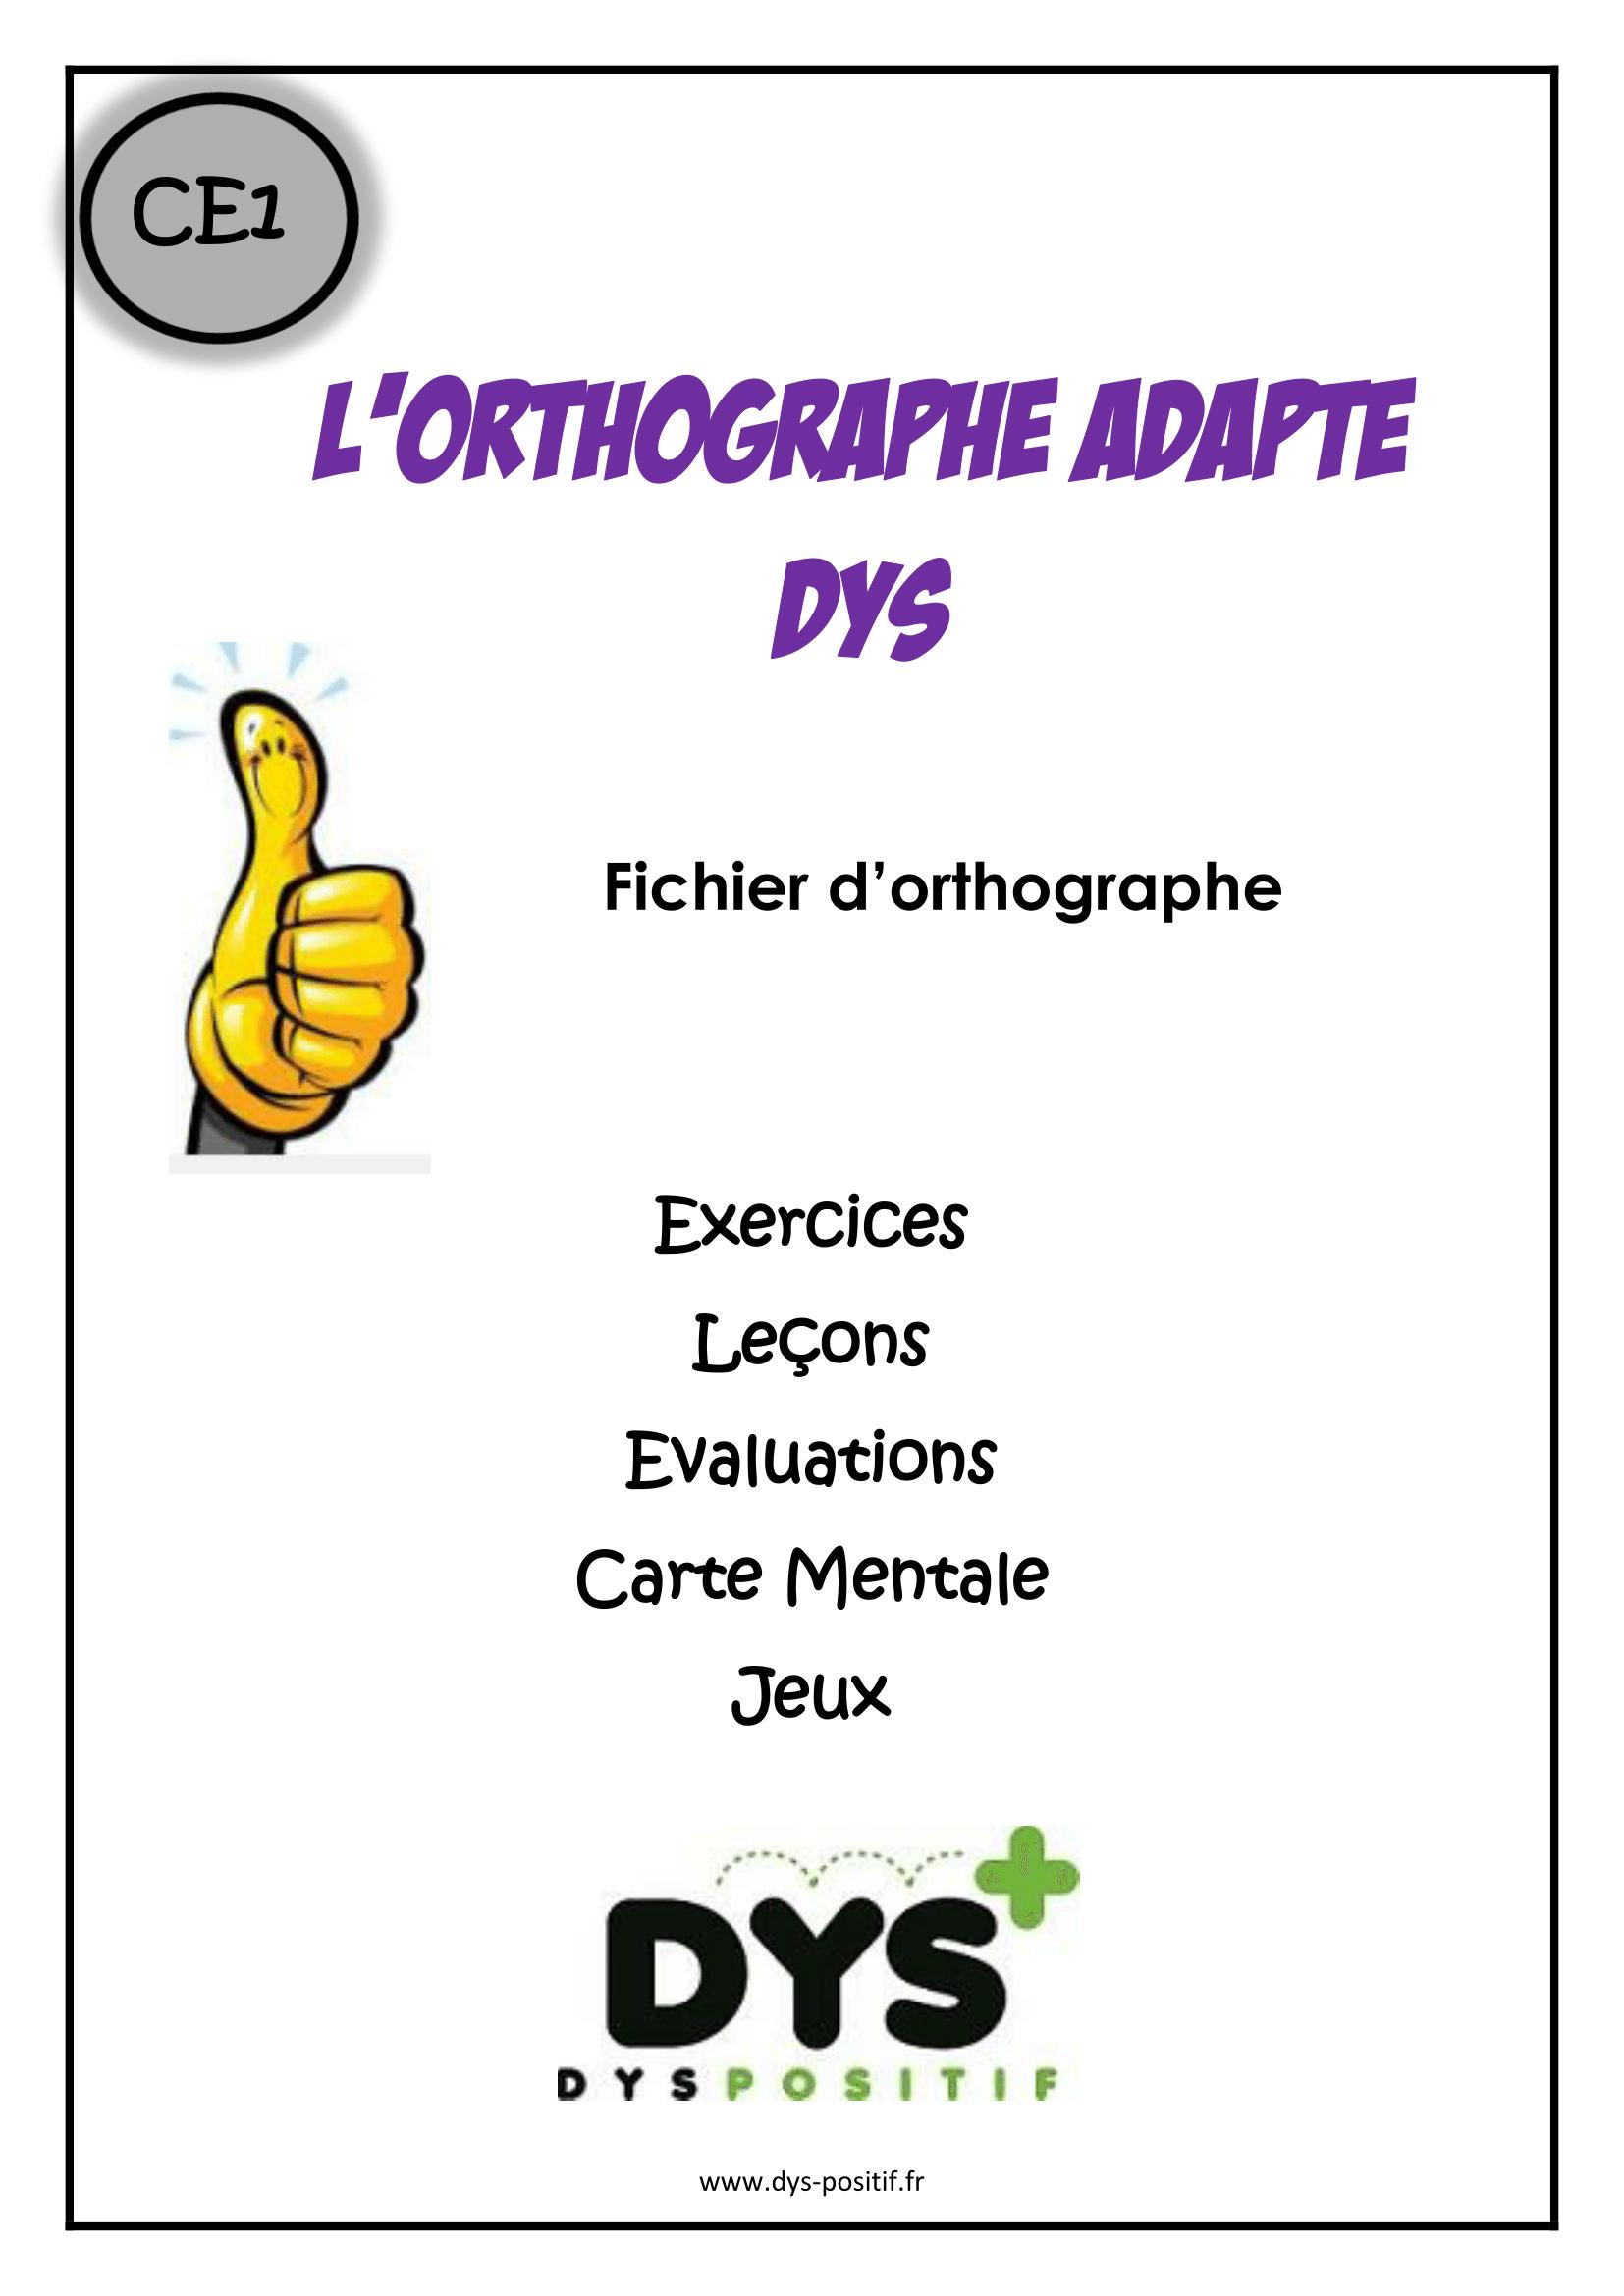 Orthographe CE1   ortho   Pinterest   Orthographe ce1, Orthographe ce2 et CE1